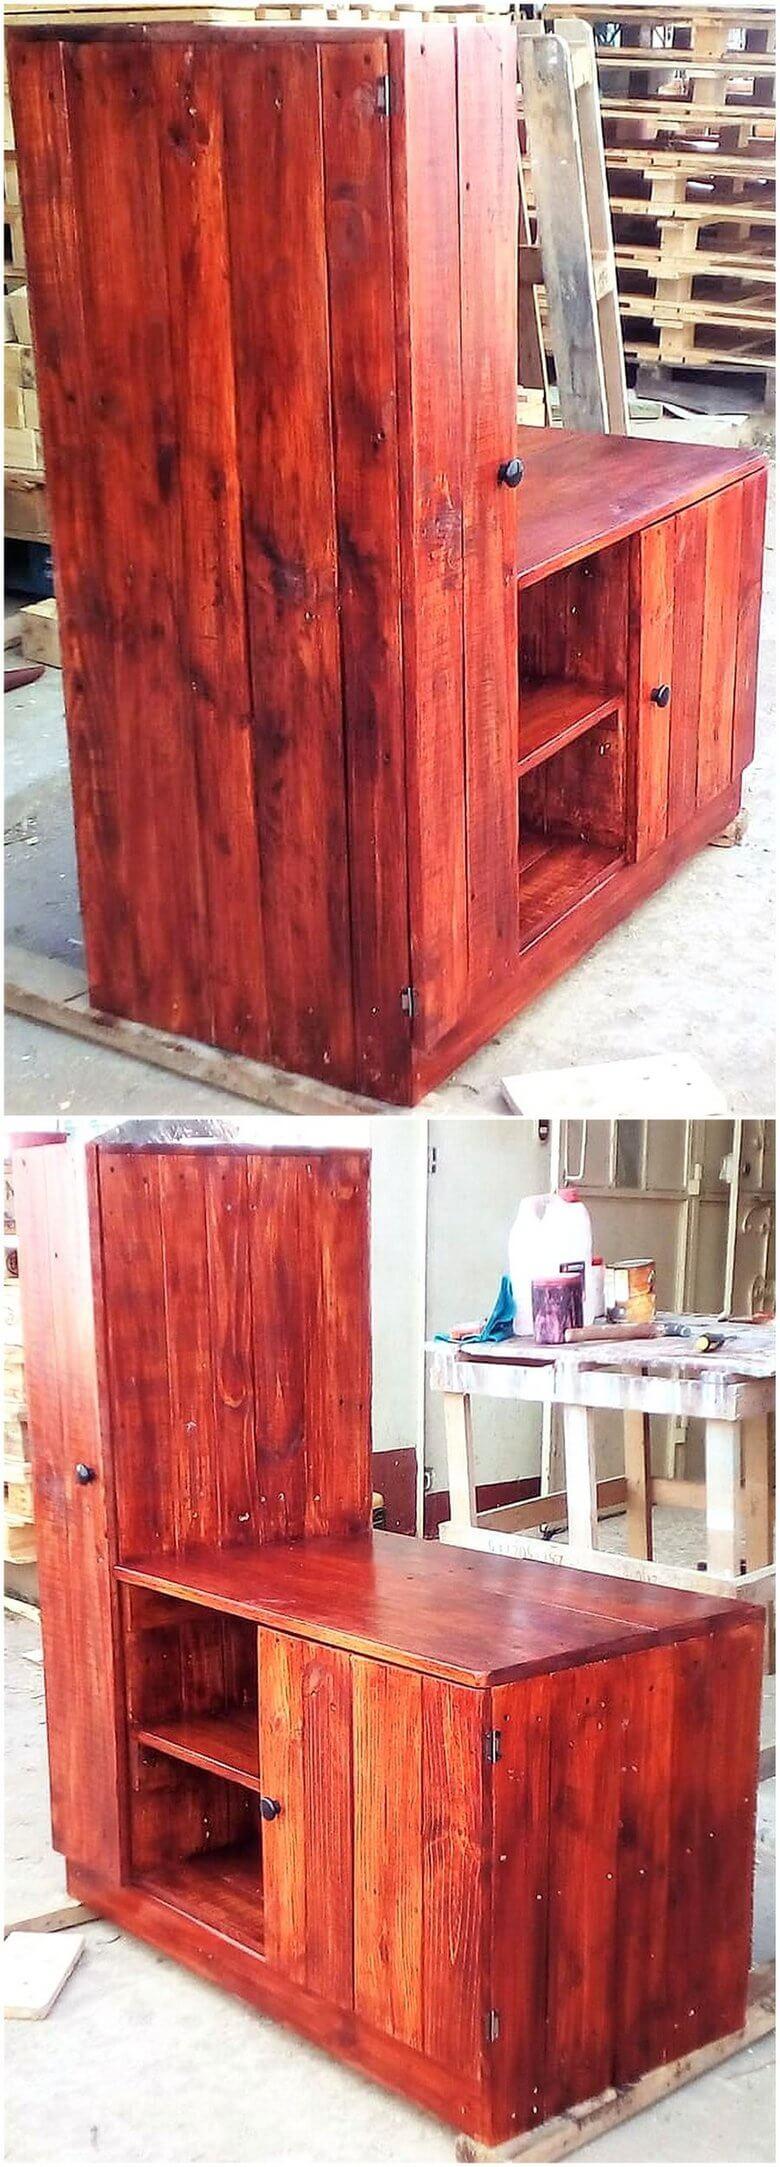 pallet rustic look tv stand